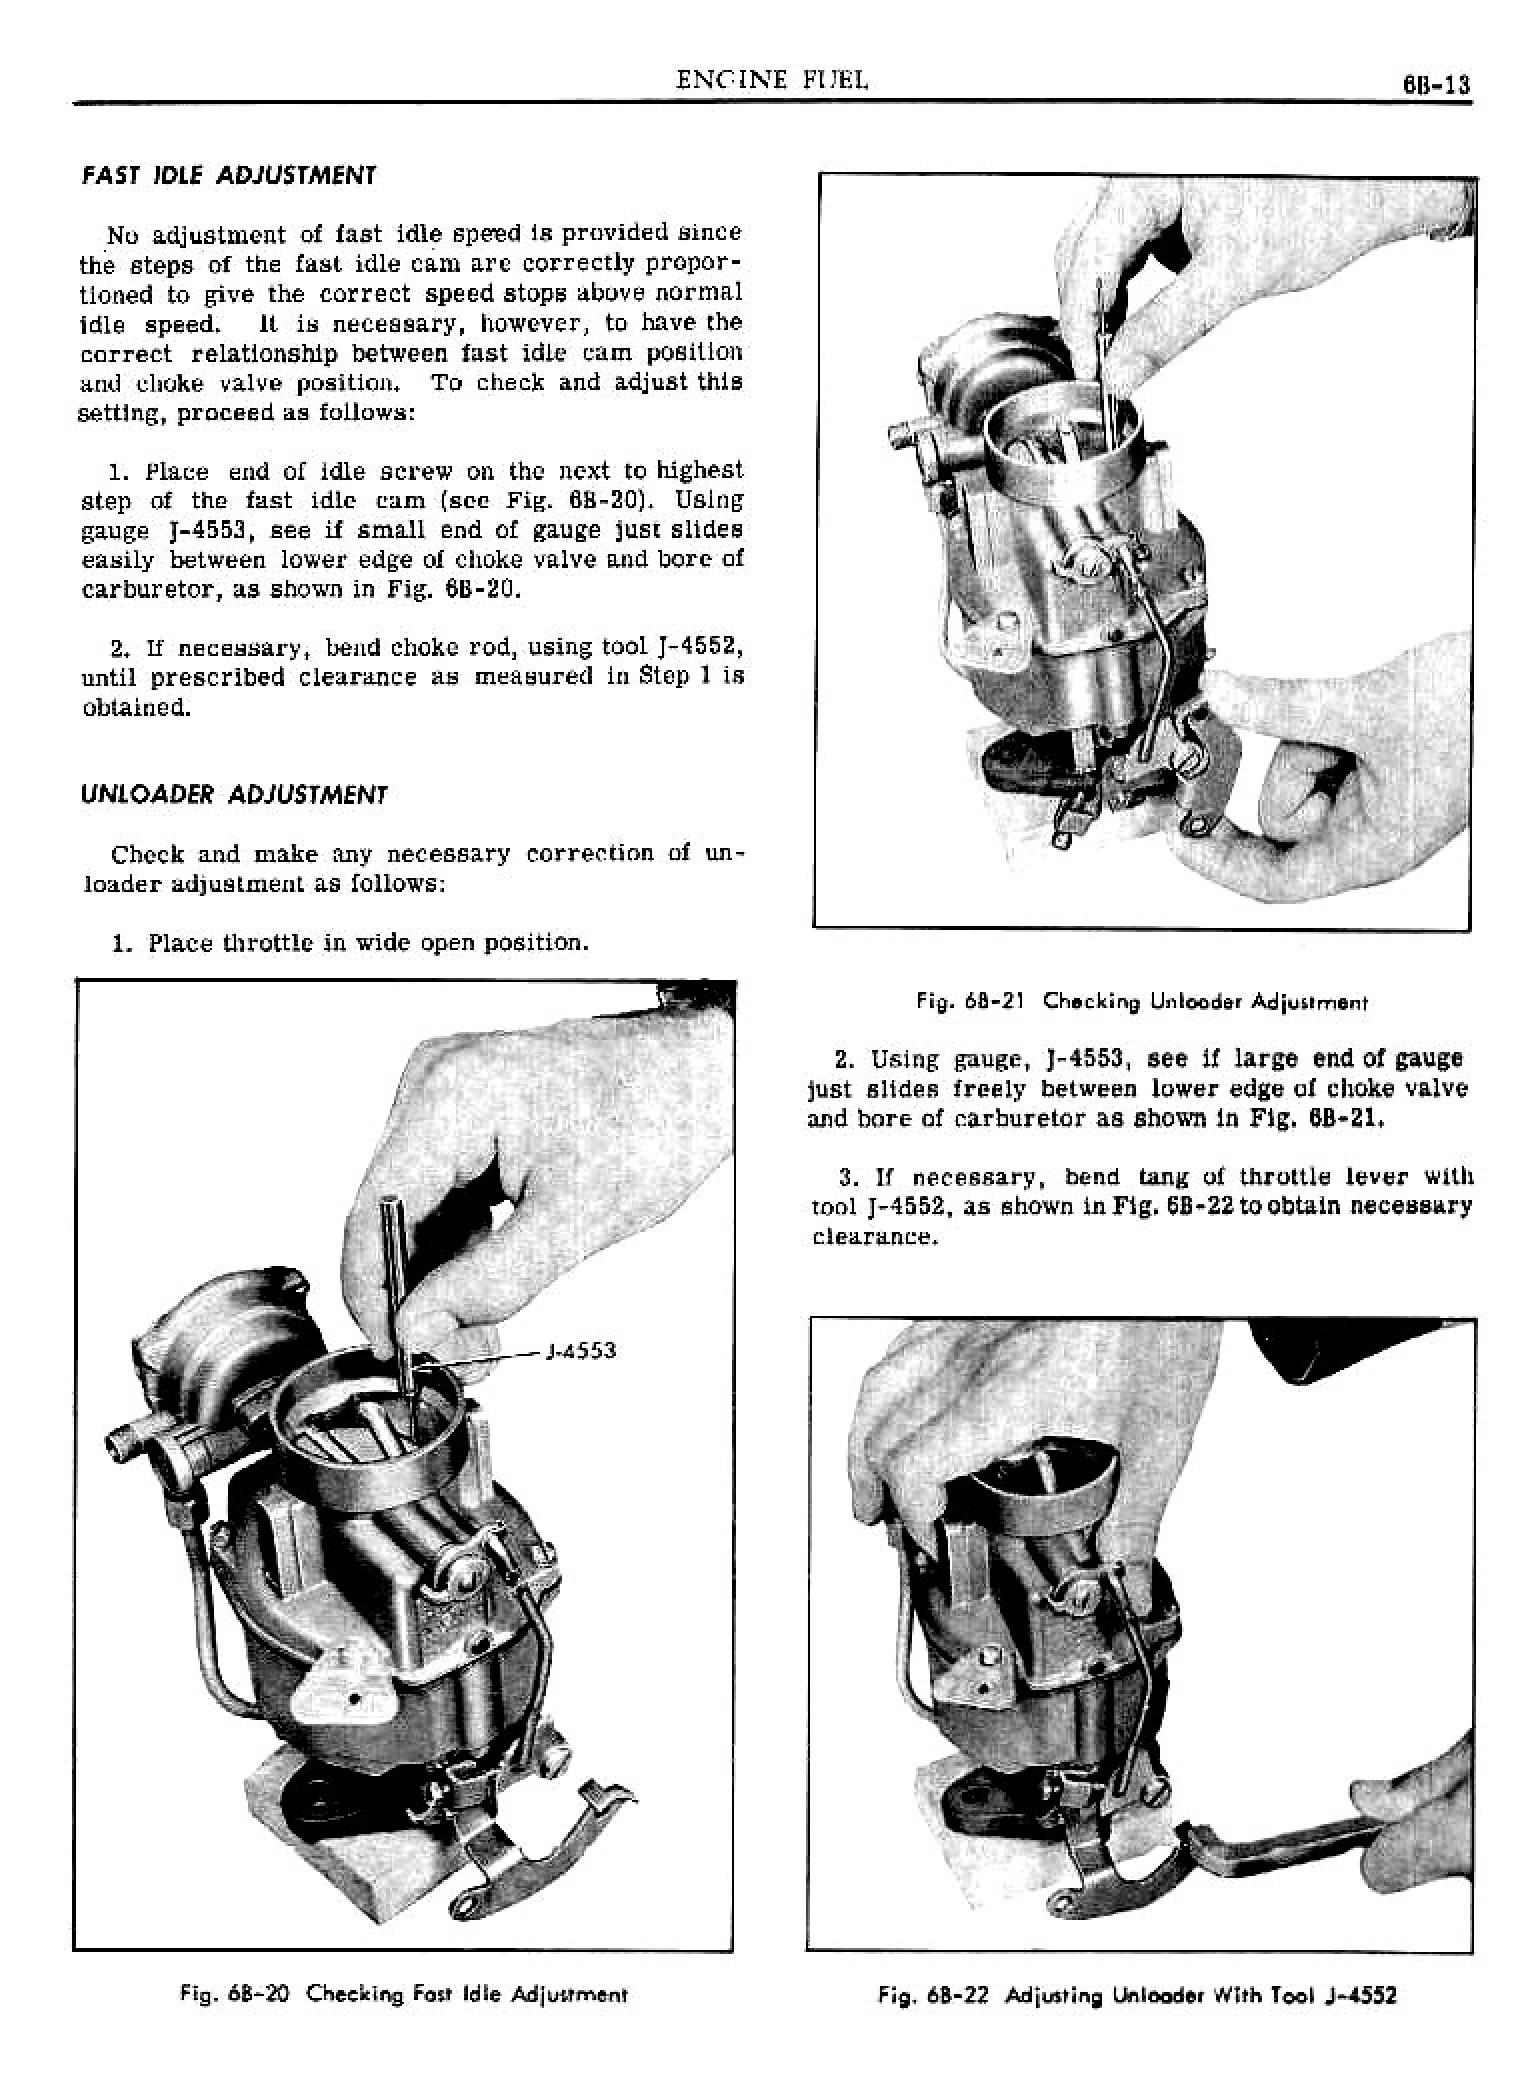 1949 Pontiac Shop Manual- Engine Fuel Page 13 of 42